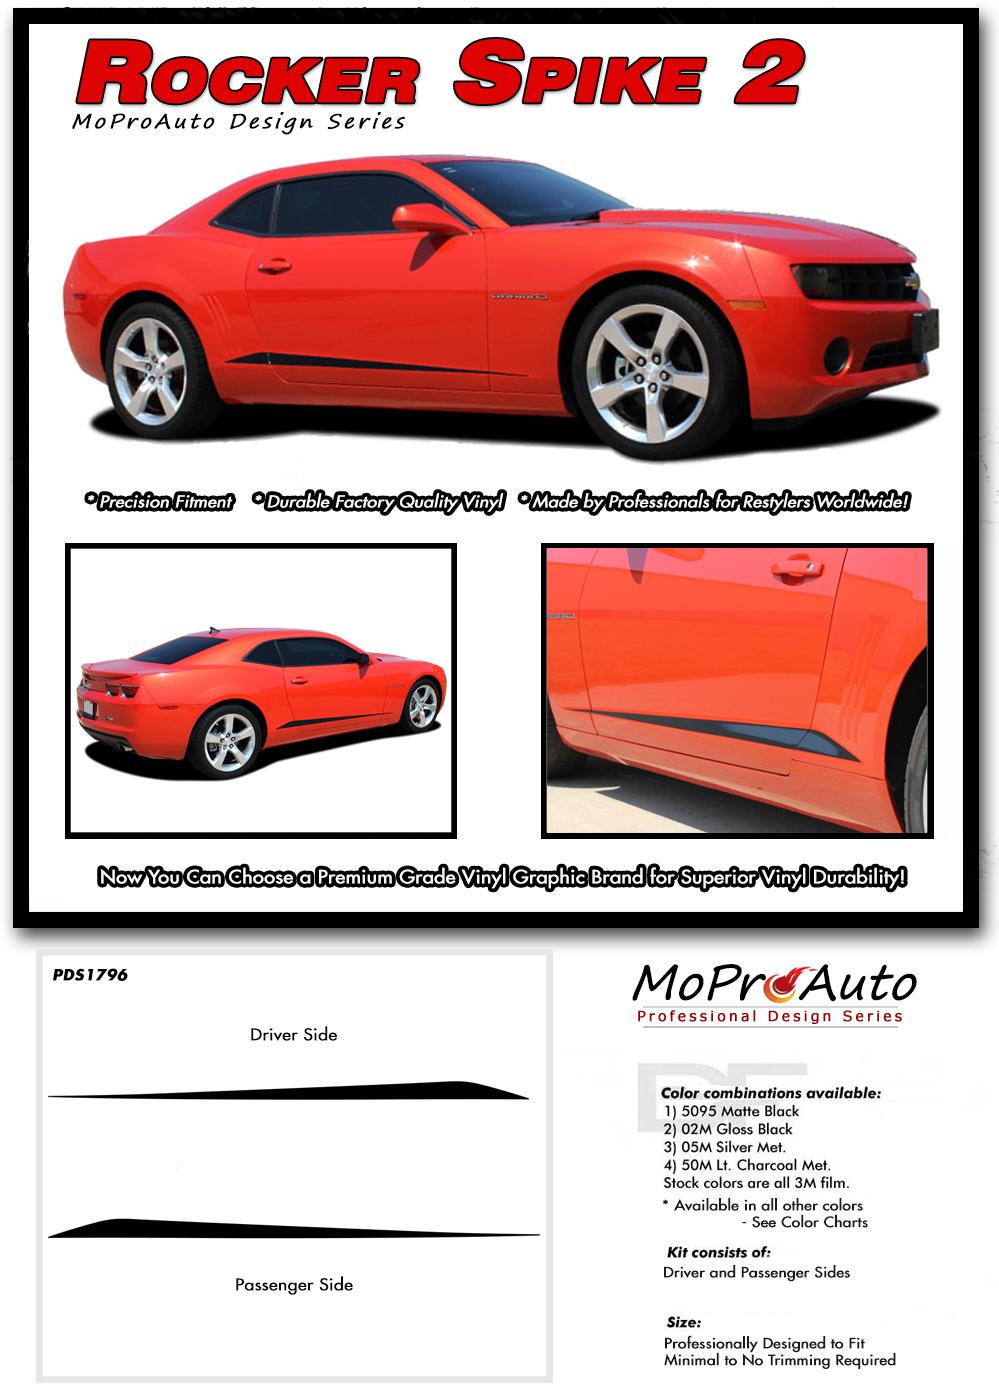 2014-2015 Chevy Camaro Vinyl Graphics Kits, Decals, Stripes by MoProAuto